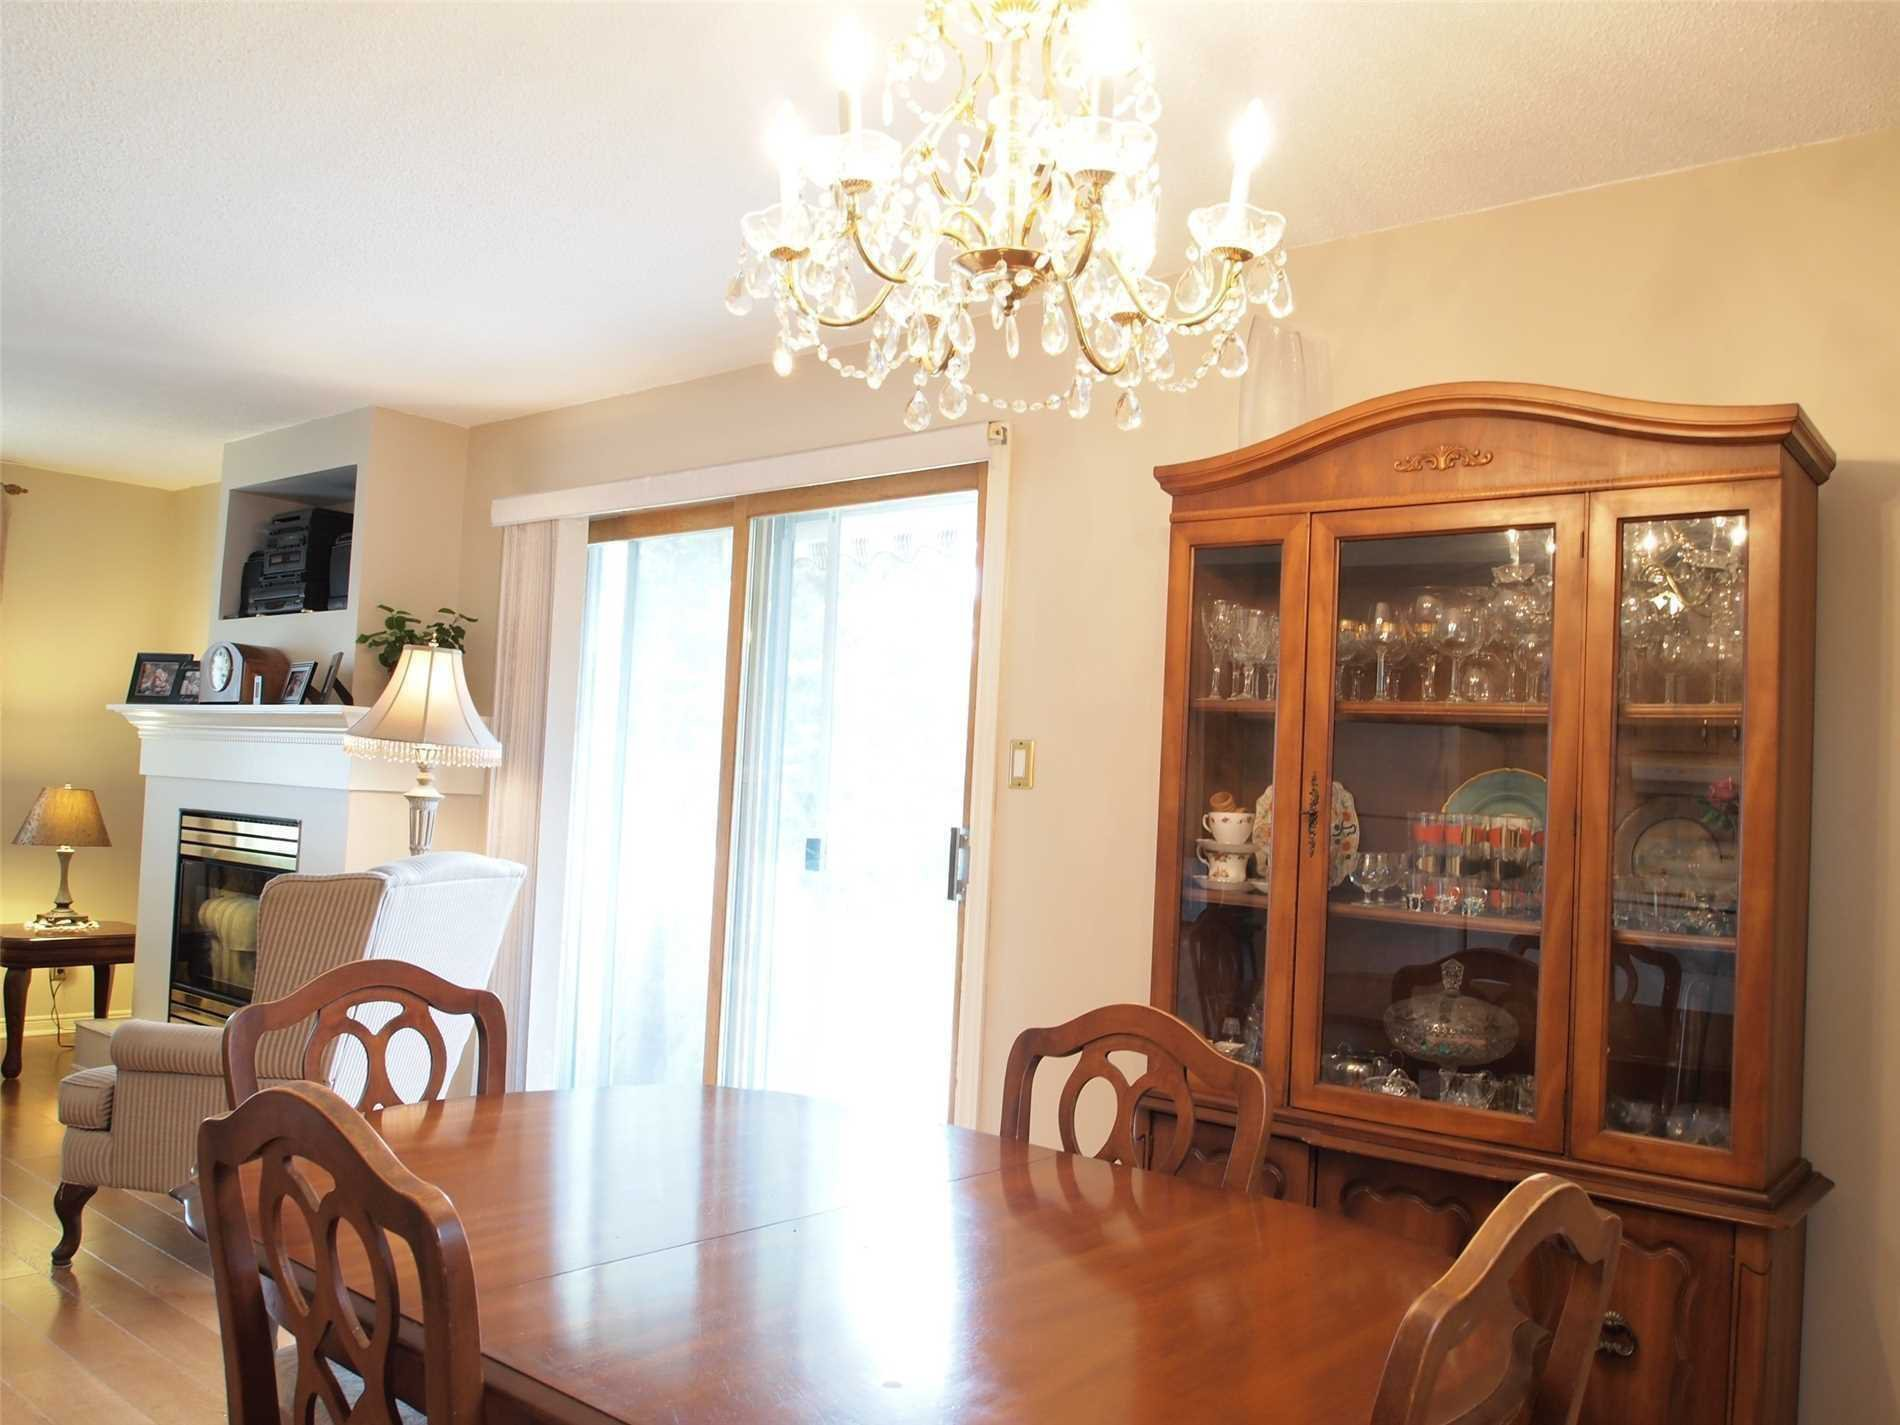 Photo 9: Photos: 105 Fifth Street in Brock: Beaverton House (Bungalow) for sale : MLS®# N4564596